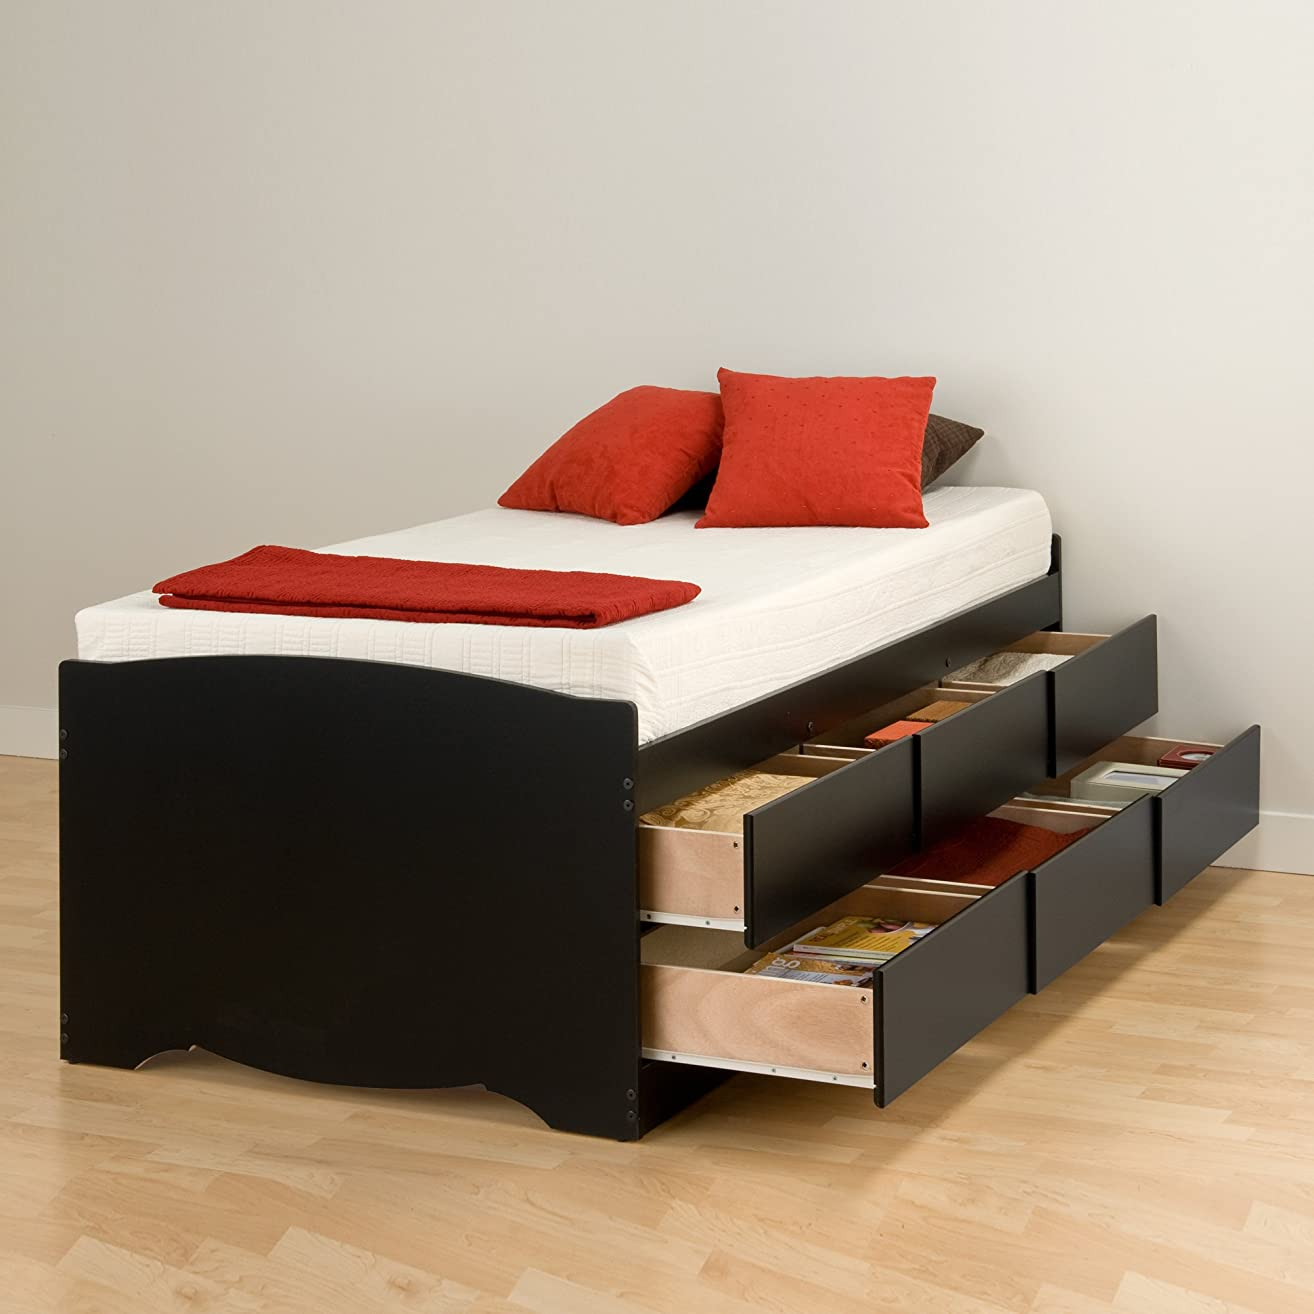 Prepac BBT-4106 Tall Twin Sonoma Platform Storage Bed with 6 Drawers, Black Mattress,